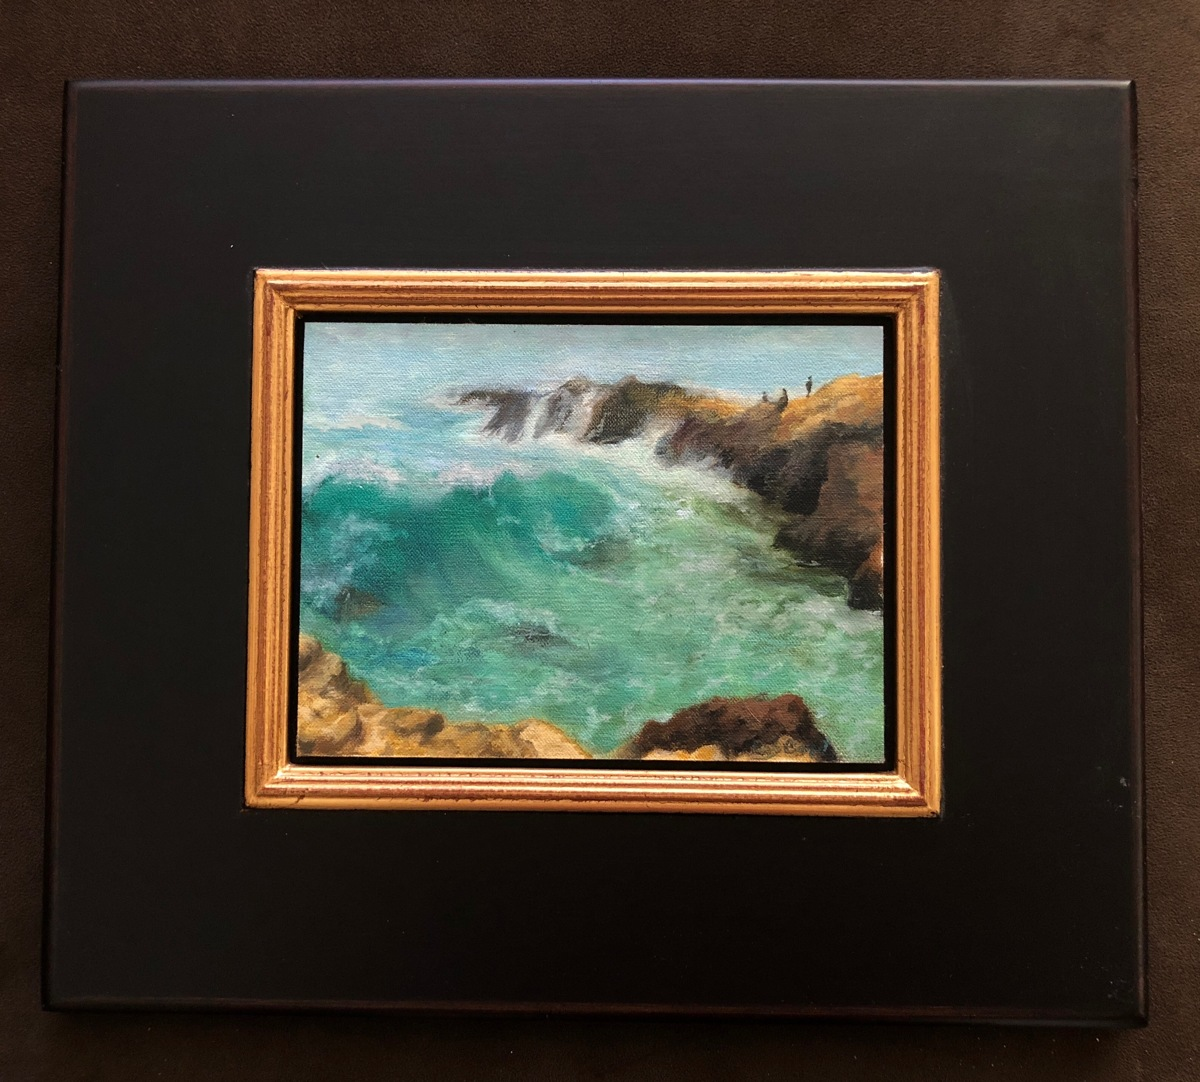 Tres Amigos, Leo Carrillo- Malibu (large view)